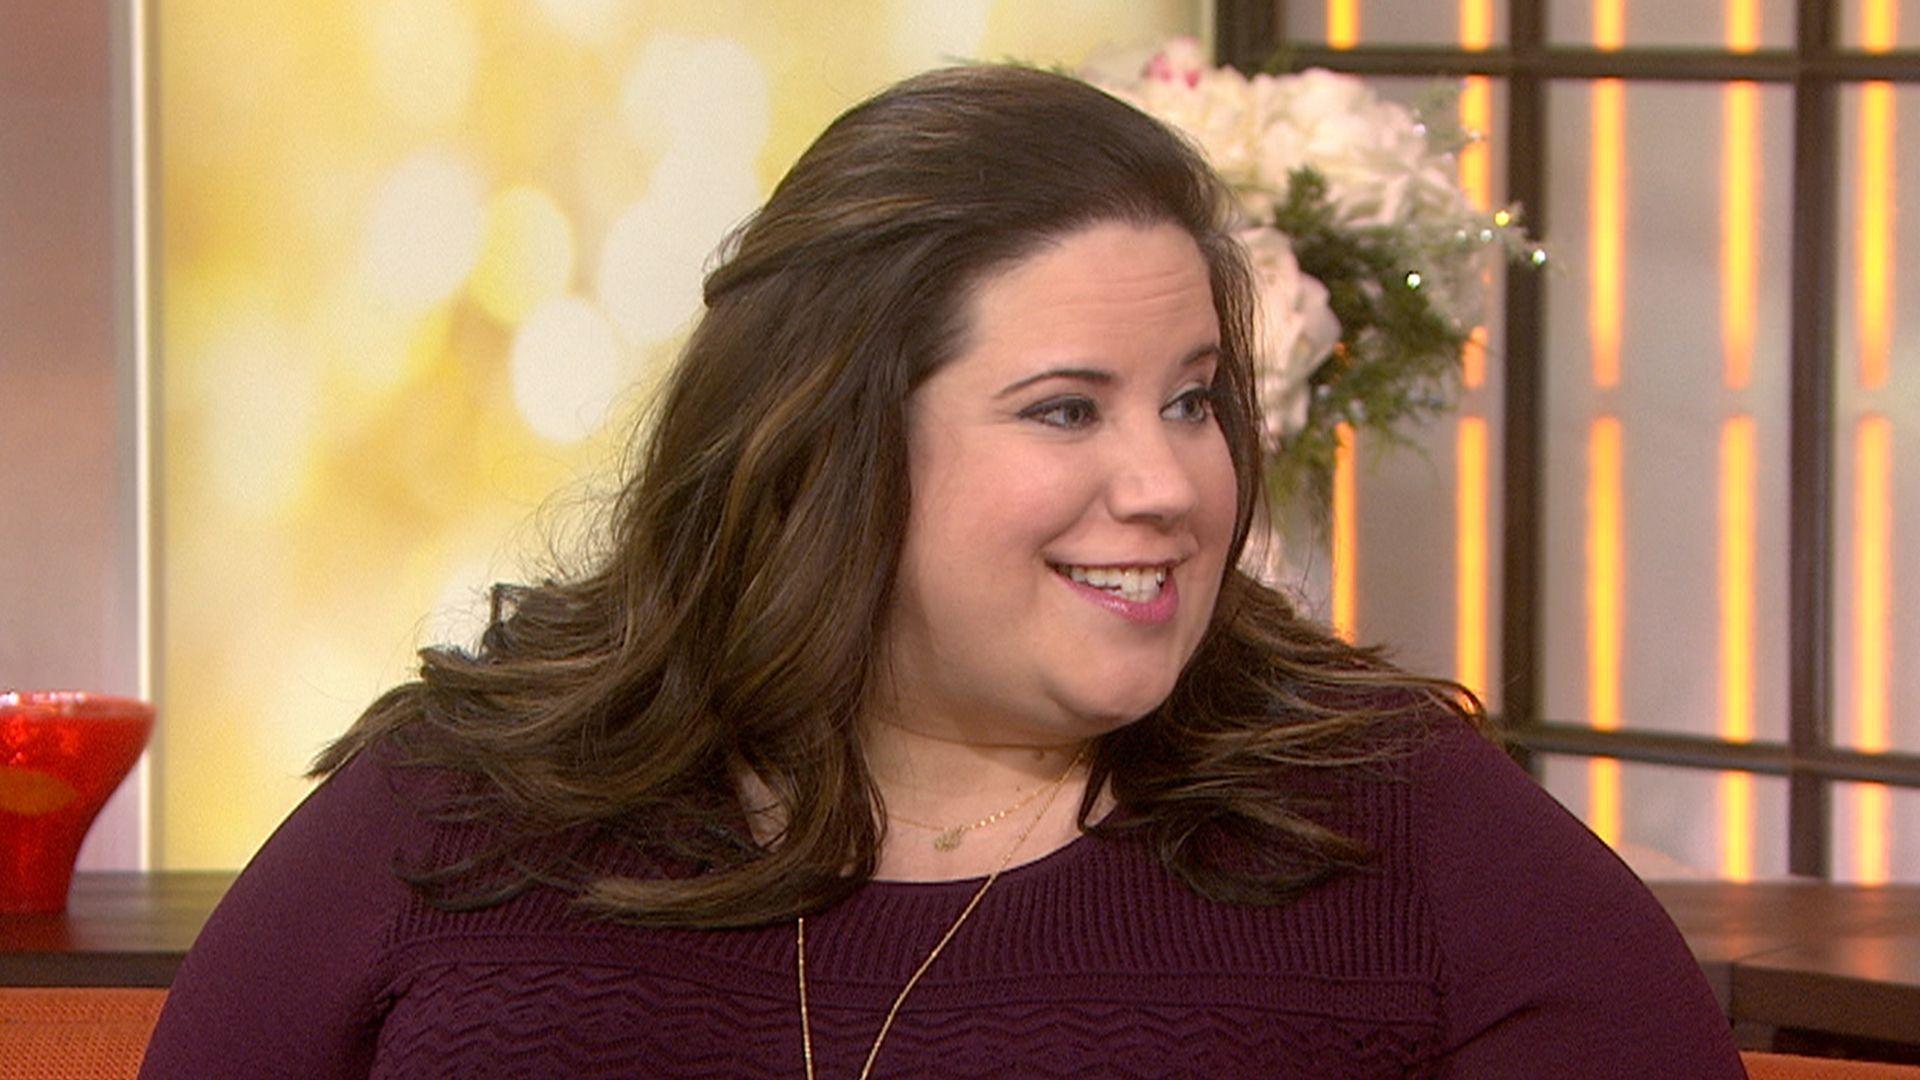 'Fat Girl Dancing' star talks reality show about 'Fat Fabulous Life'